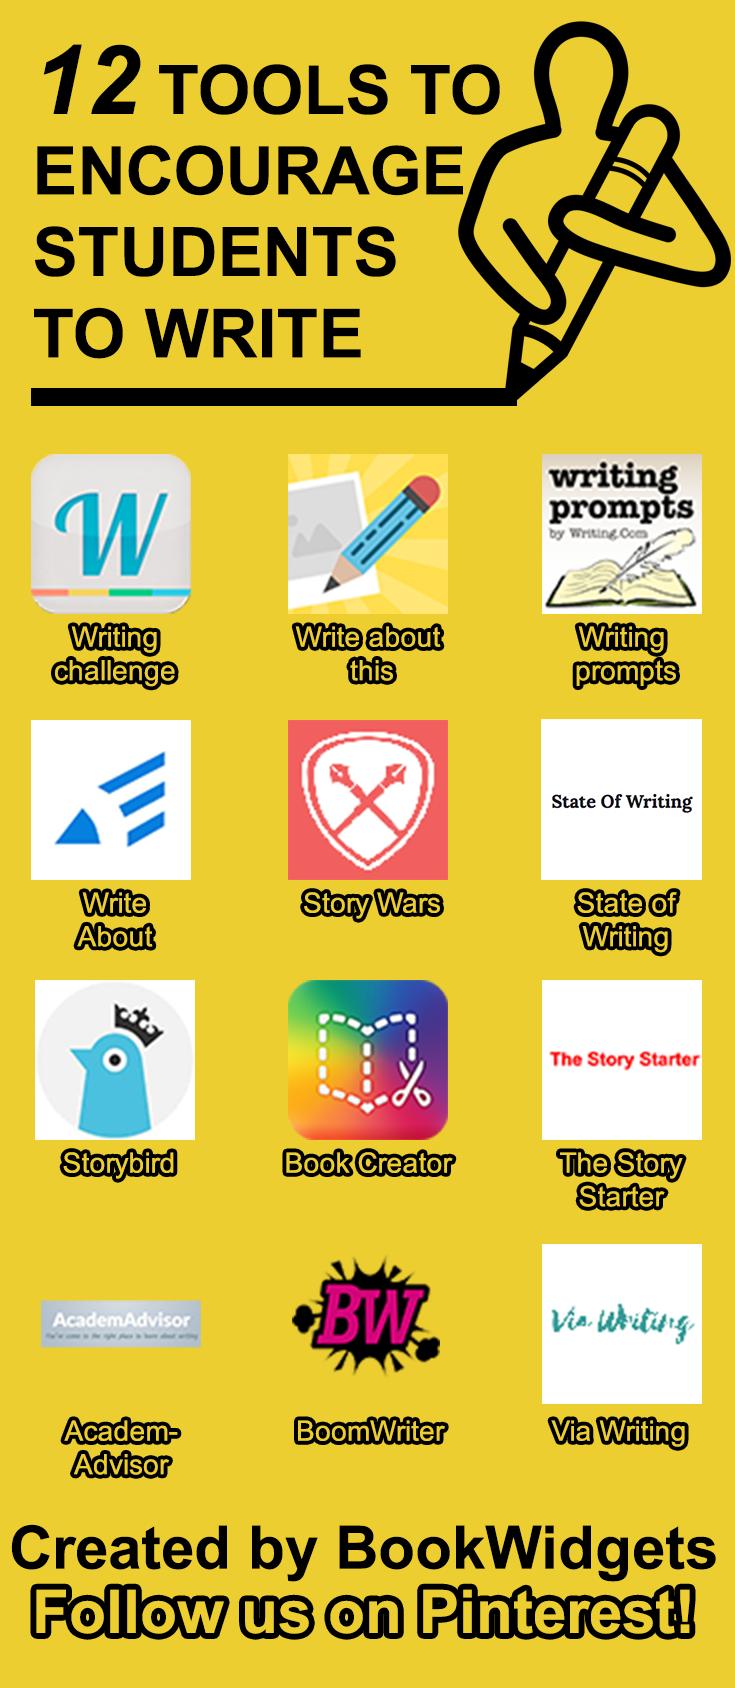 12 tools to encourage students to write